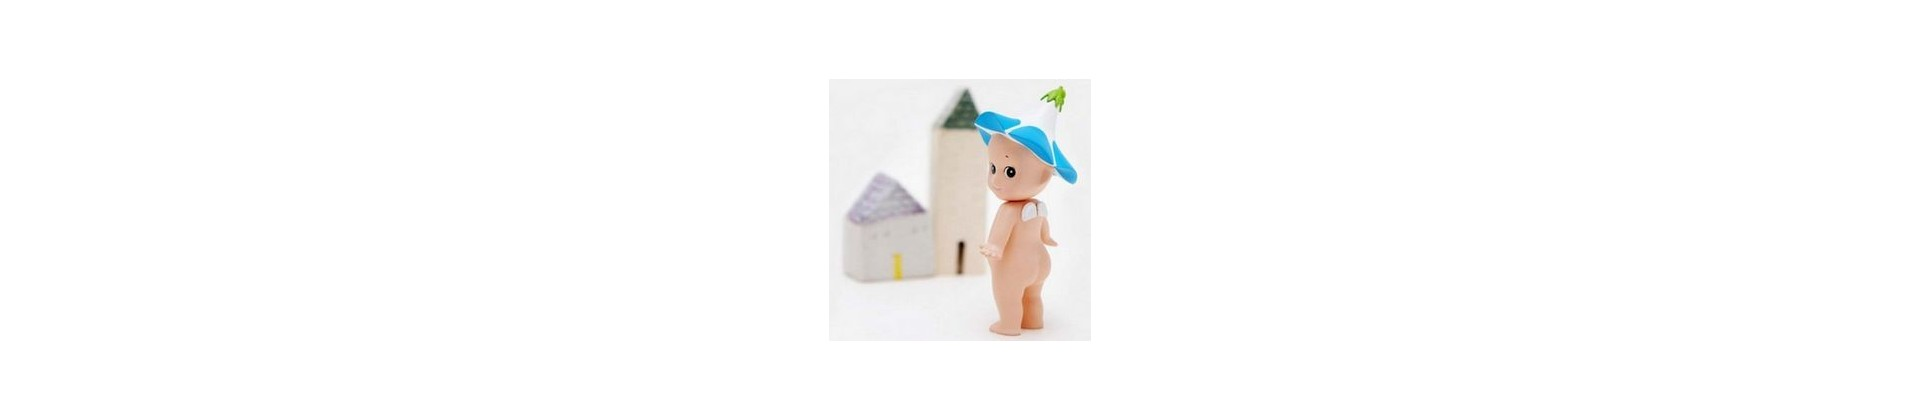 Petits jouets ludiques - sonny angel